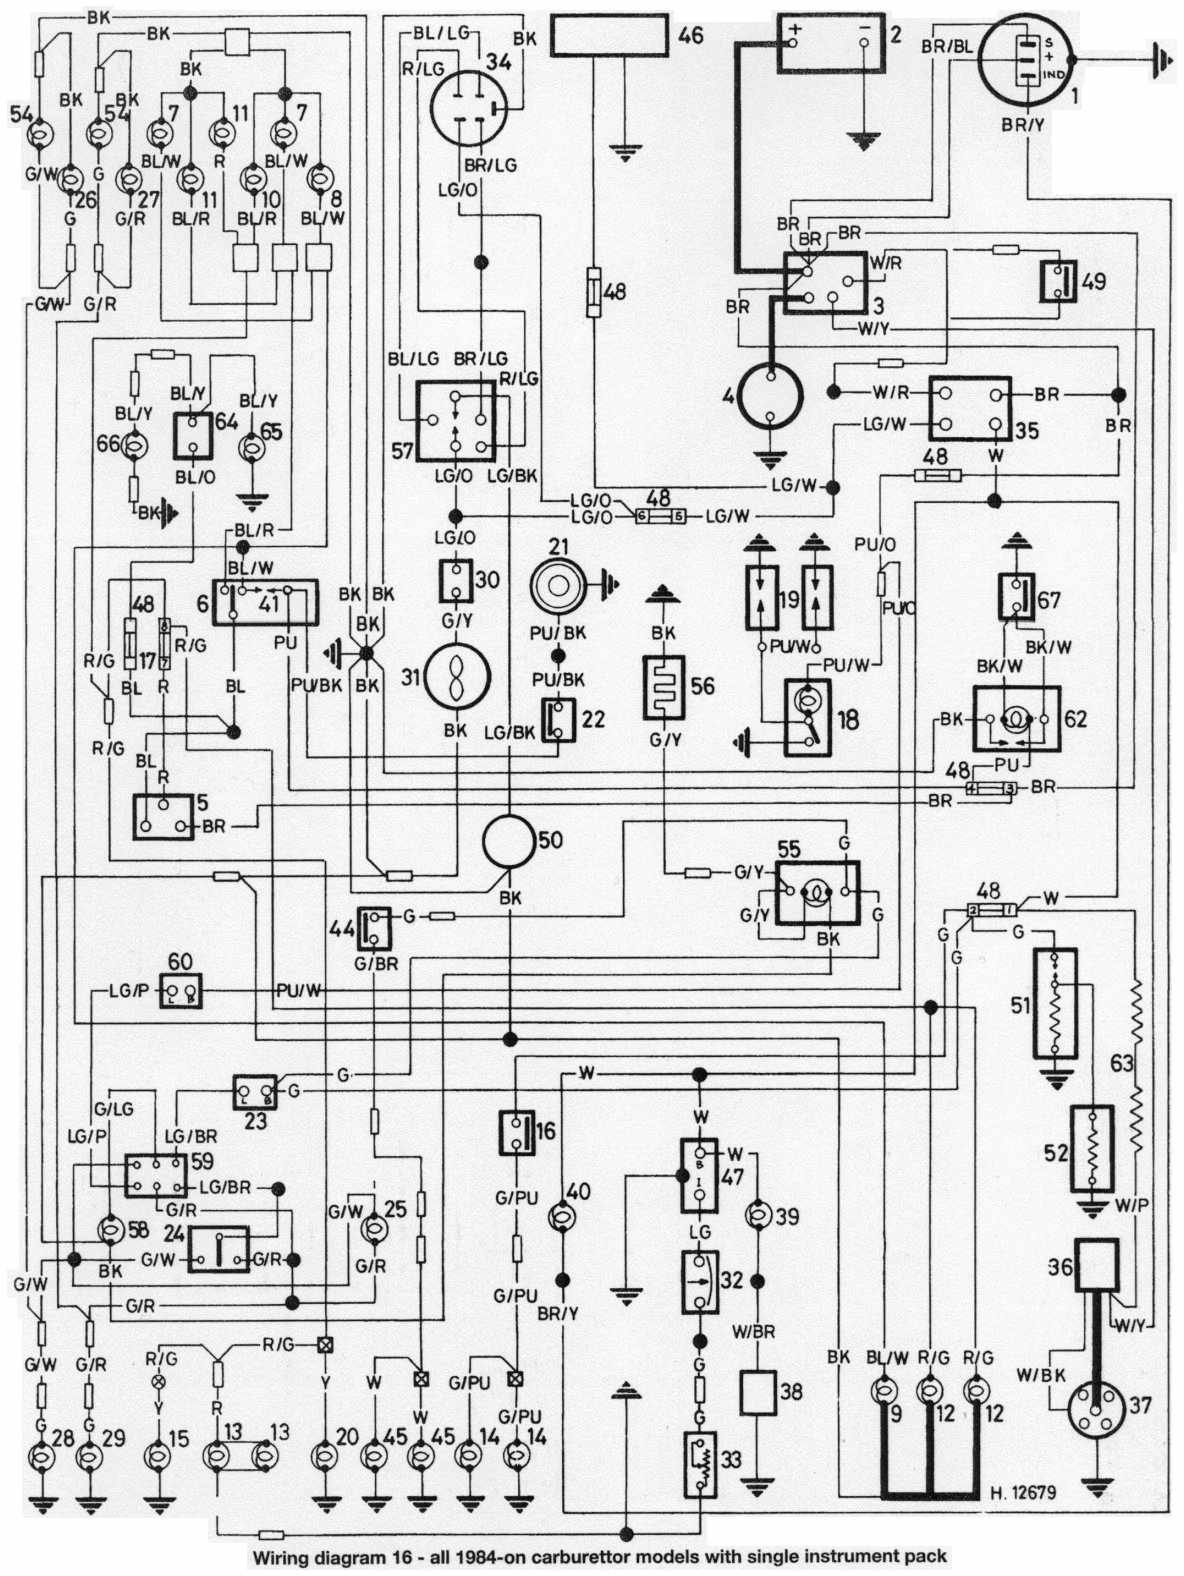 2011 Mini Cooper S Headlight Wiring Schematic Good 1st Diagram Acura Tl Third Level Rh 16 6 Jacobwinterstein Com Gmc Acadia